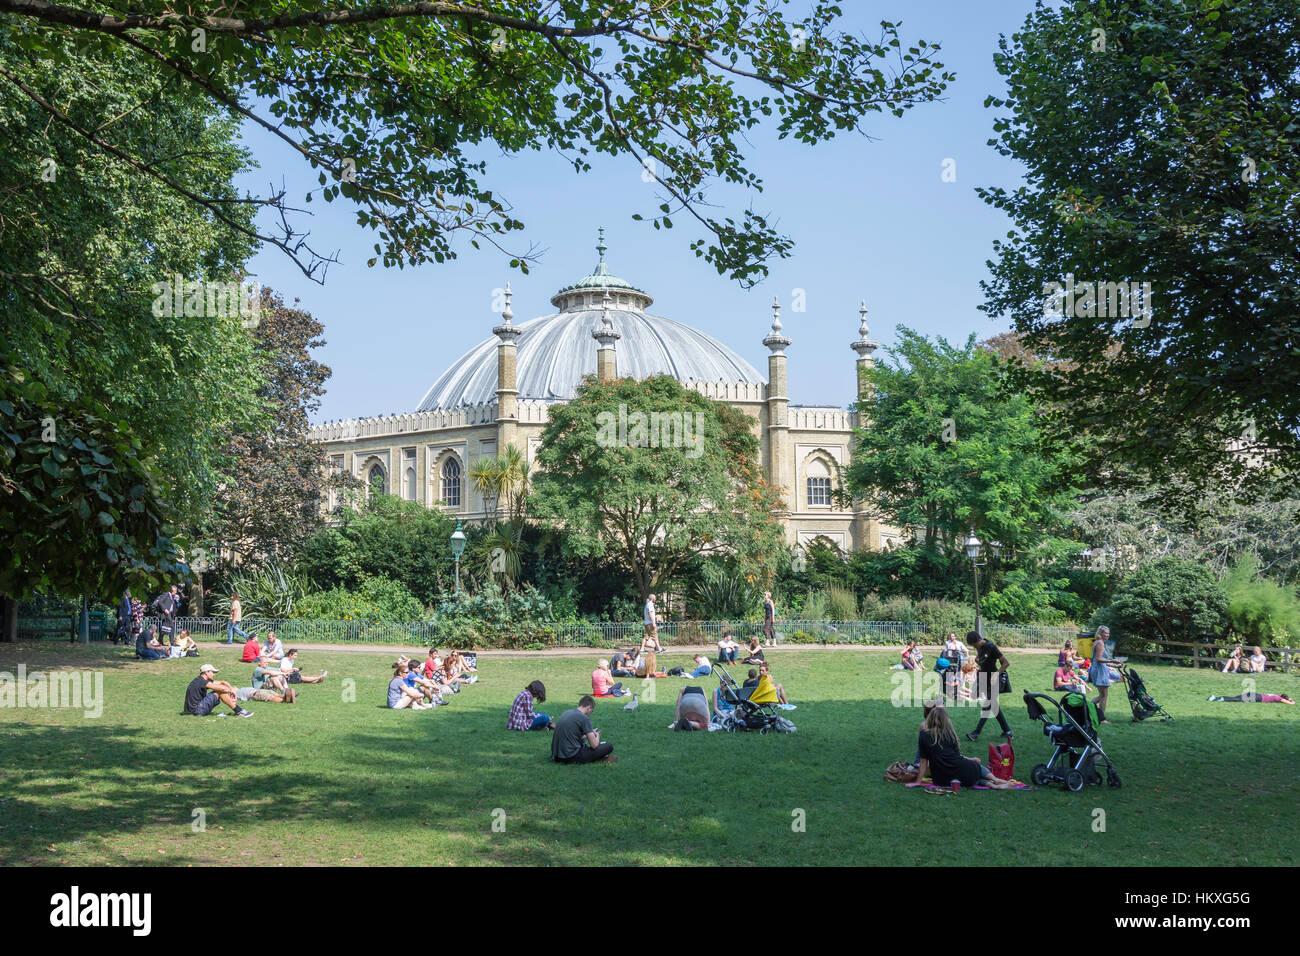 Royal Pavilion Gardens and Brighton Museum & Art Gallery, Brighton, East Sussex, England, United Kingdom - Stock Image